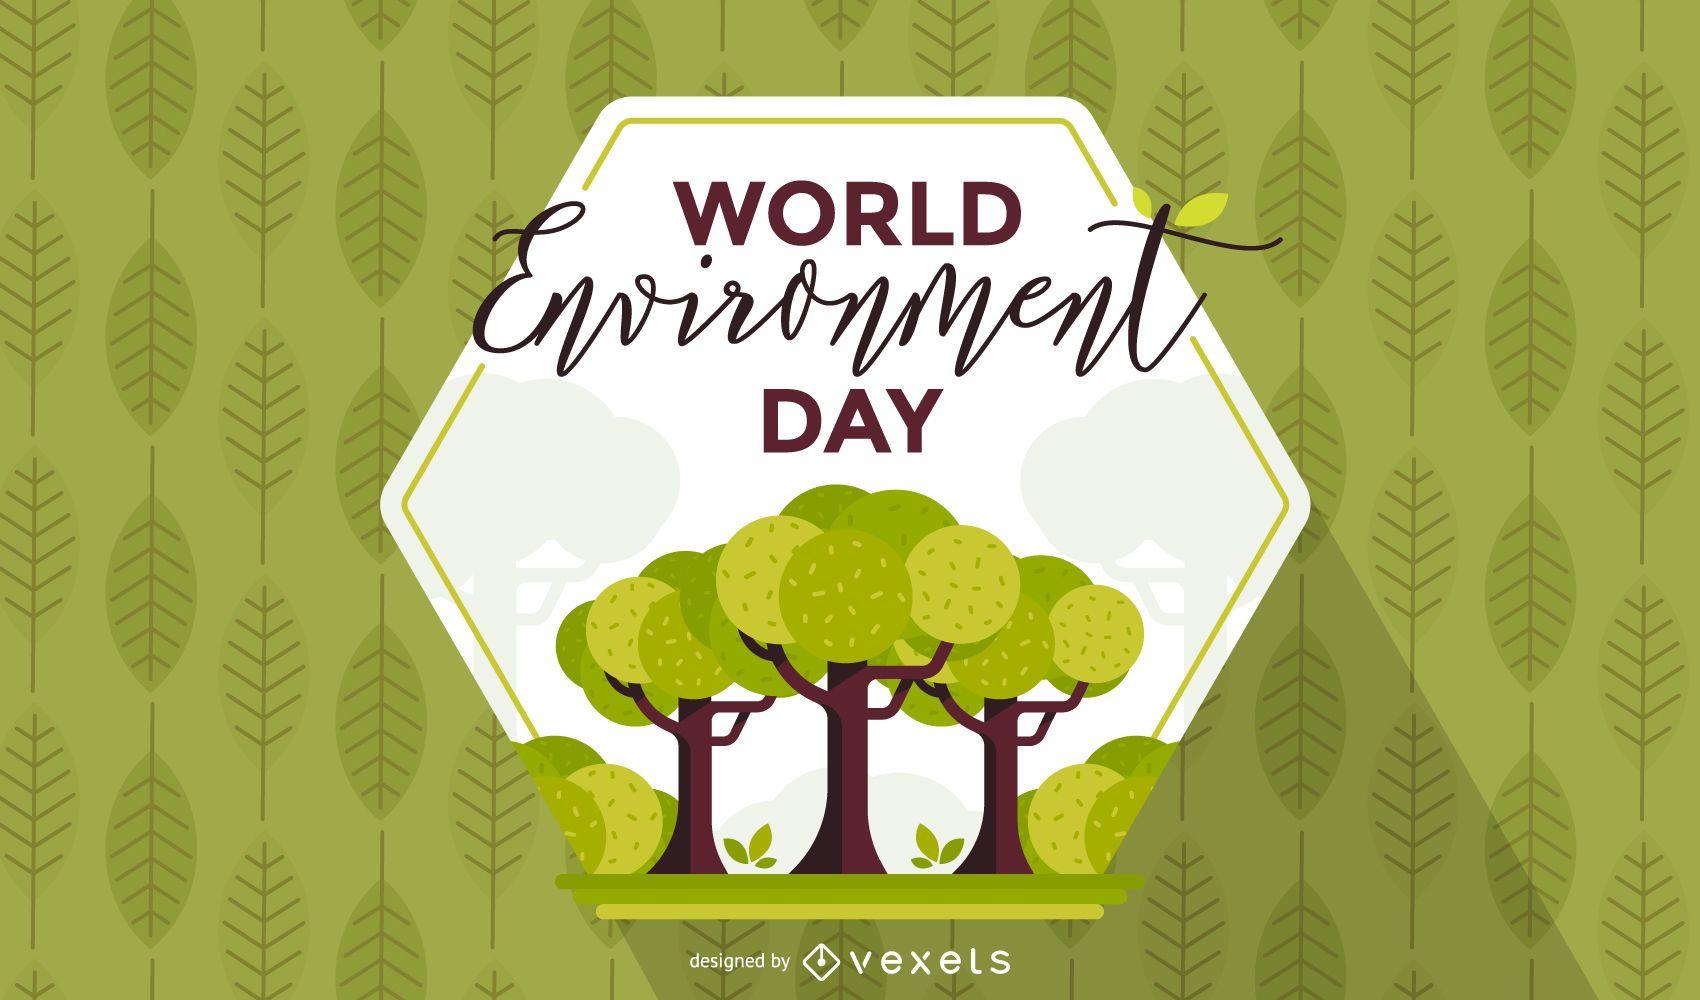 World environment day hexagon background